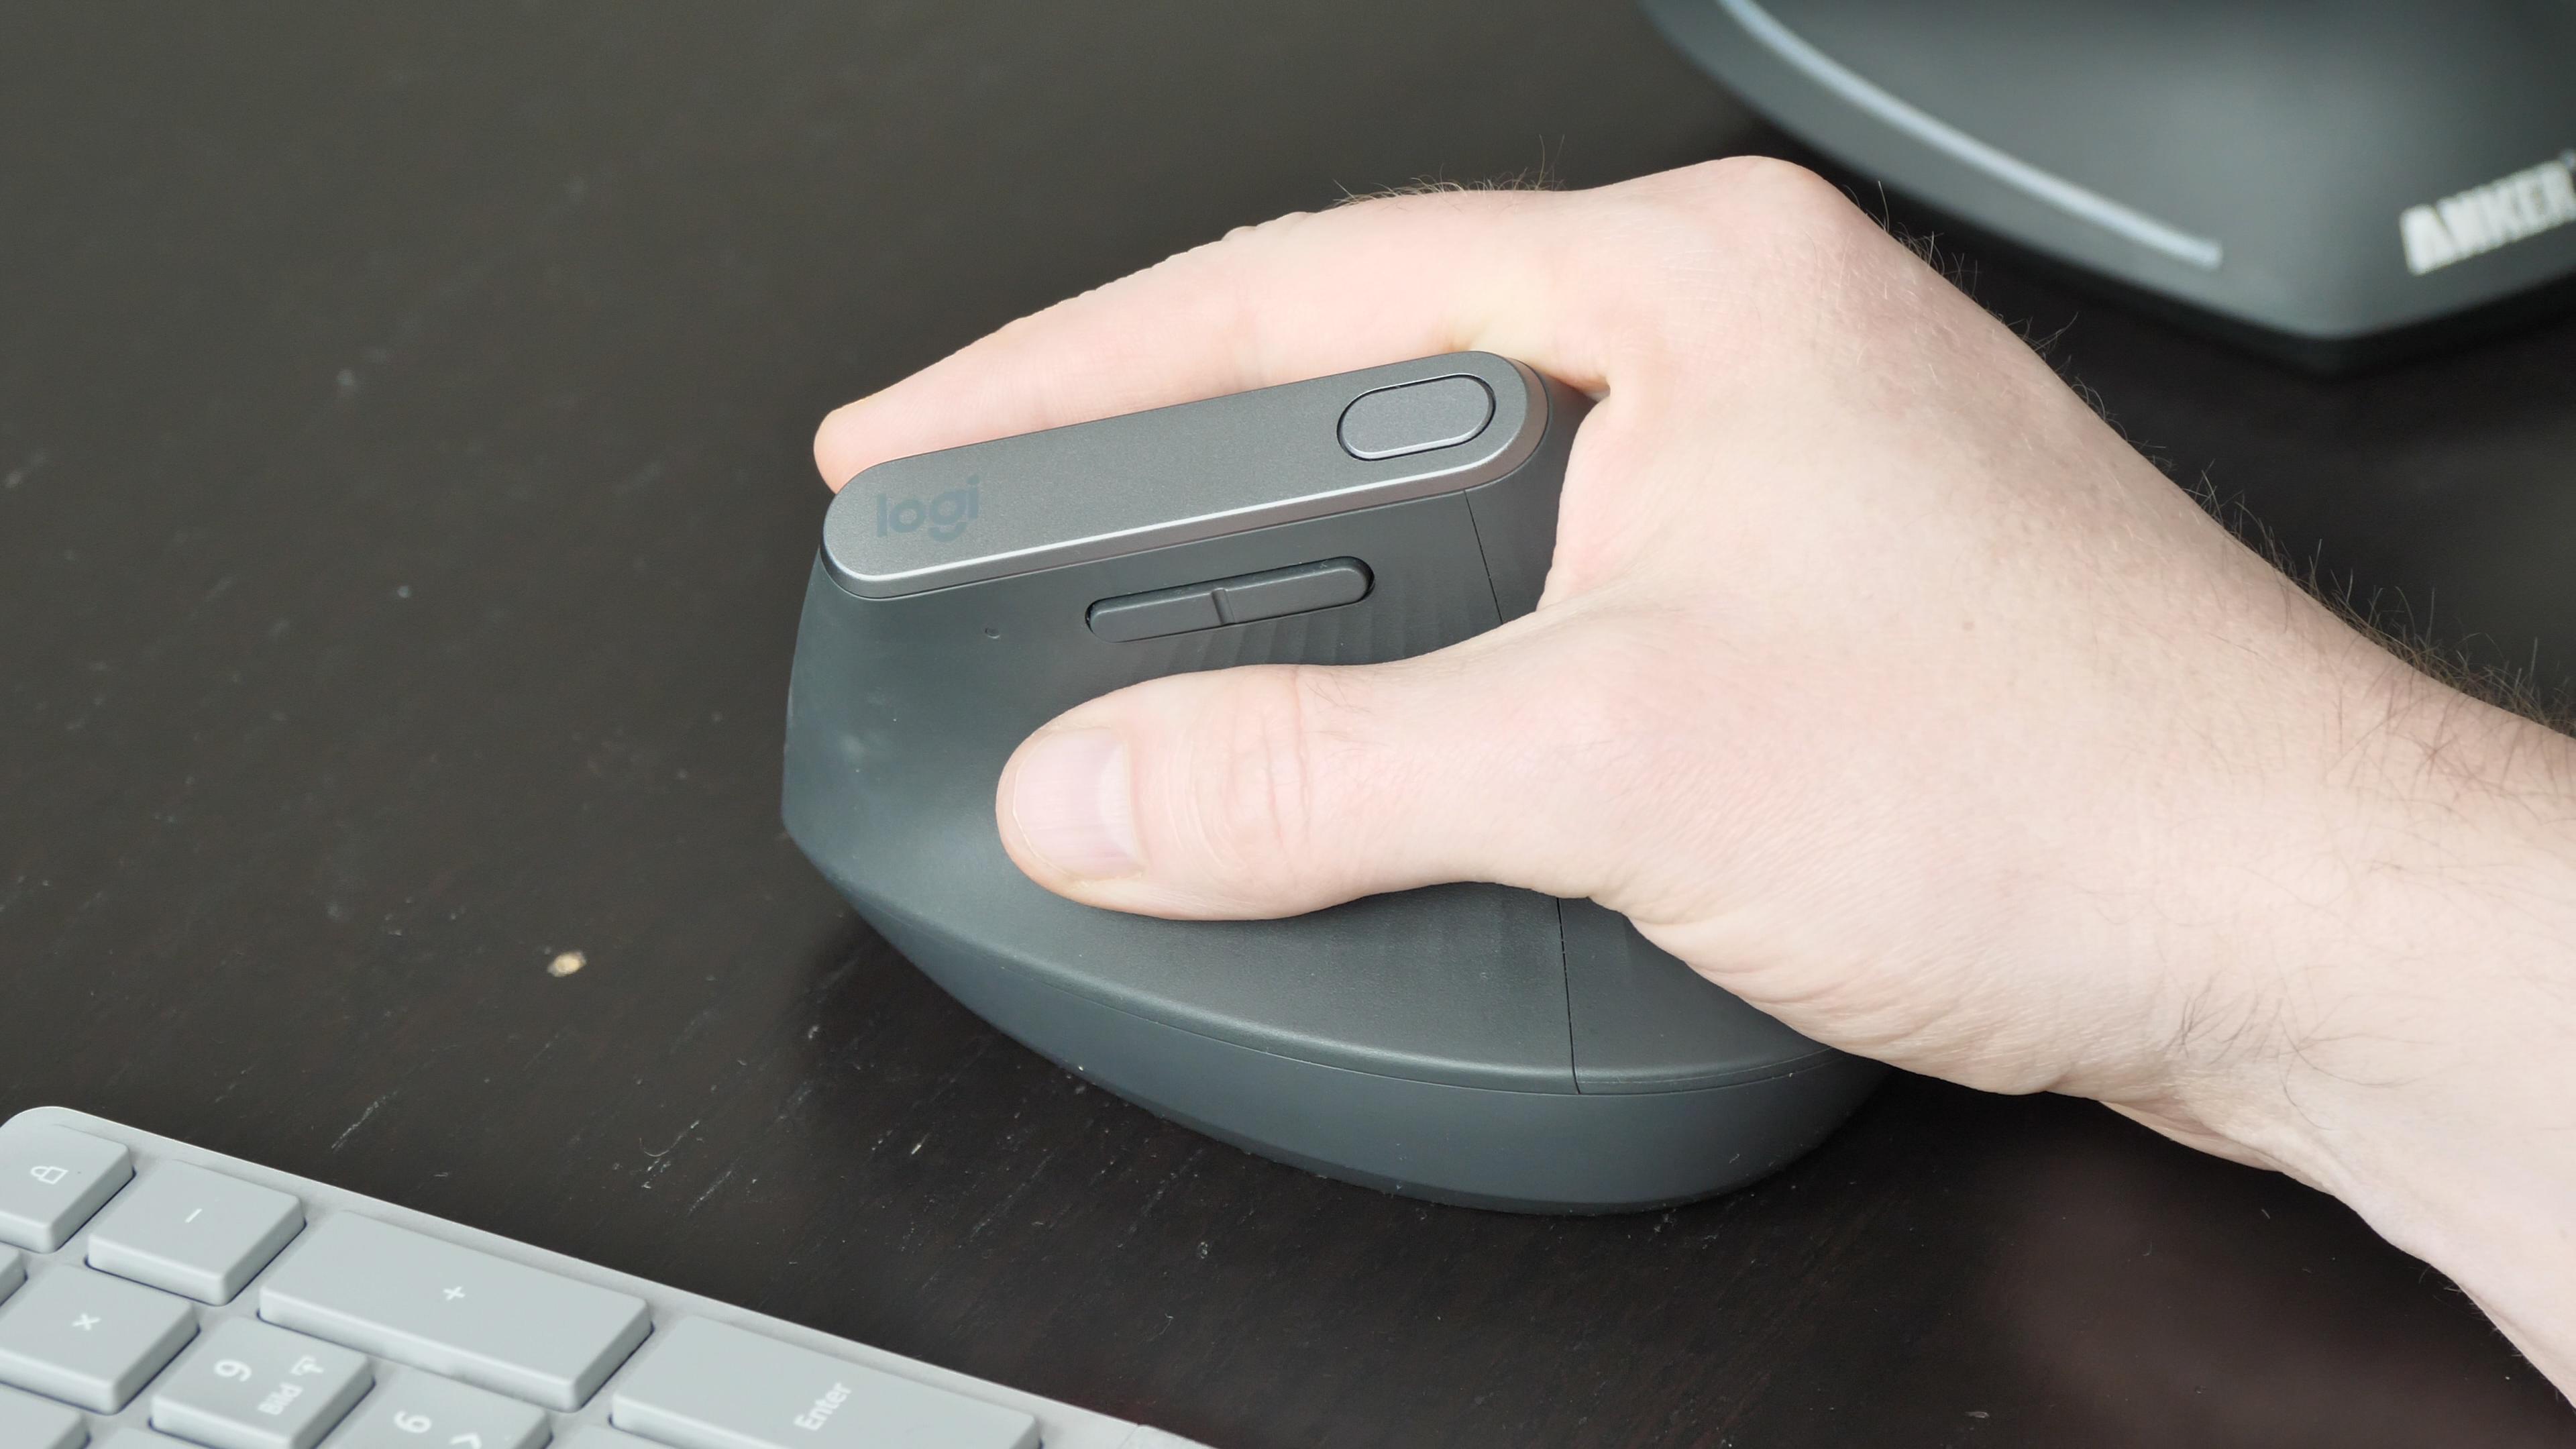 Logitechs MX Vertical im Test: So teuer muss eine gute vertikale Maus nicht sein - Logitechs Maus MX Vertikal (Bild: Martin Wolf/Golem.de)